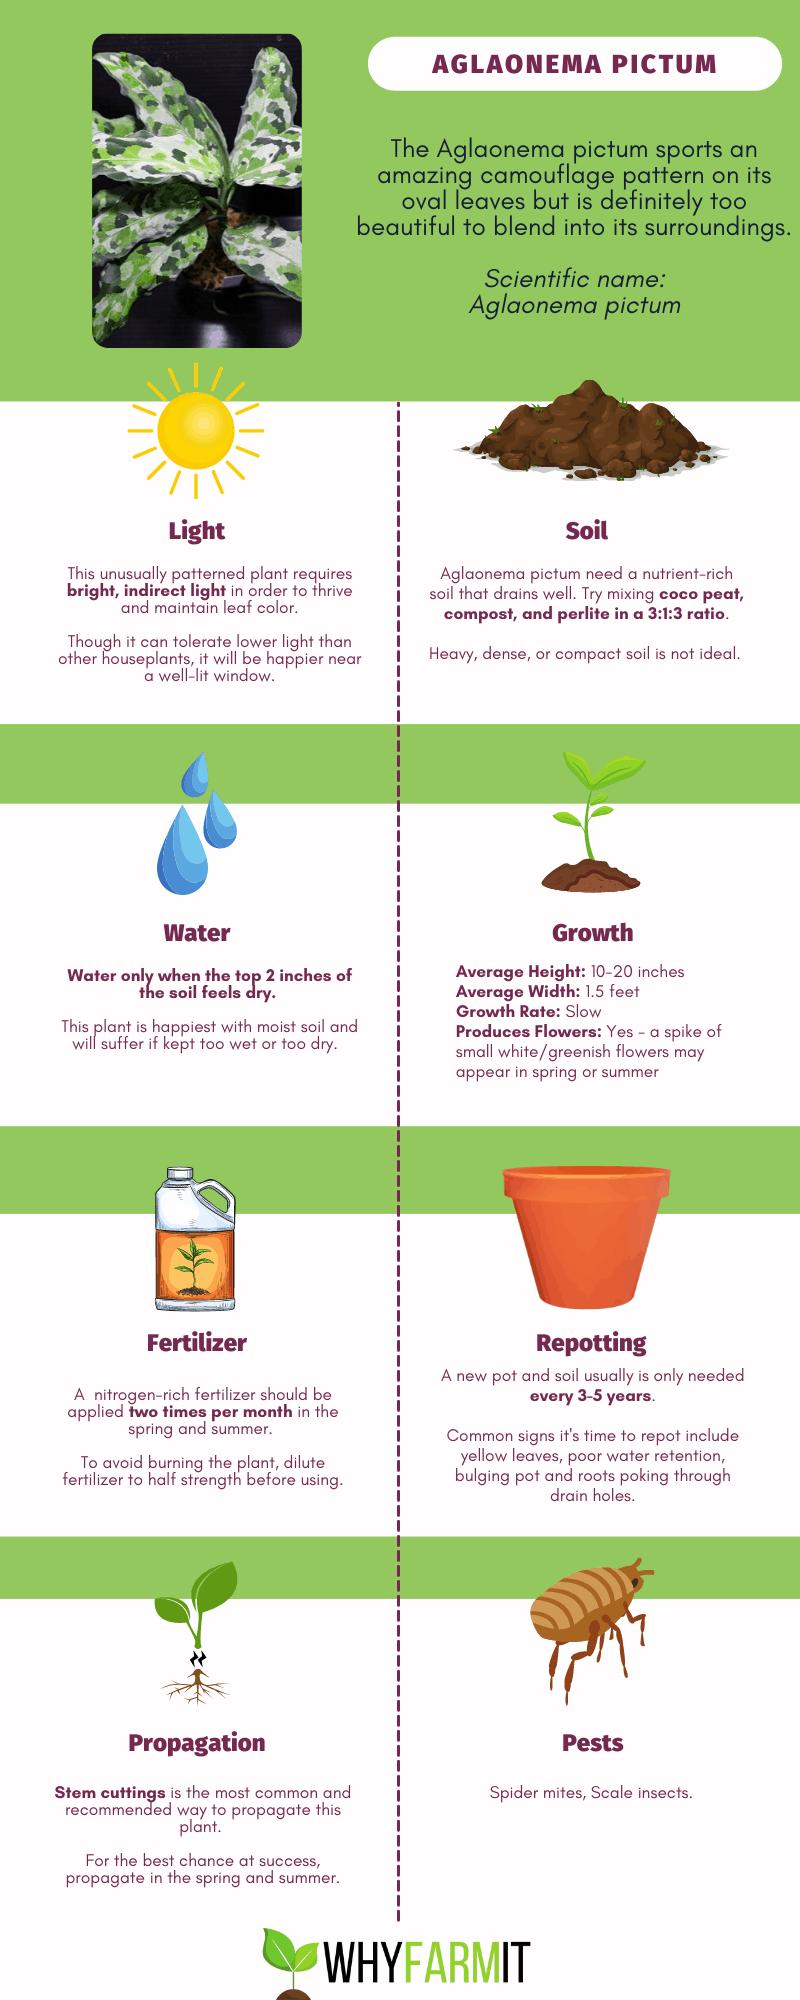 Infographic outlining care of Aglaonema pictum.